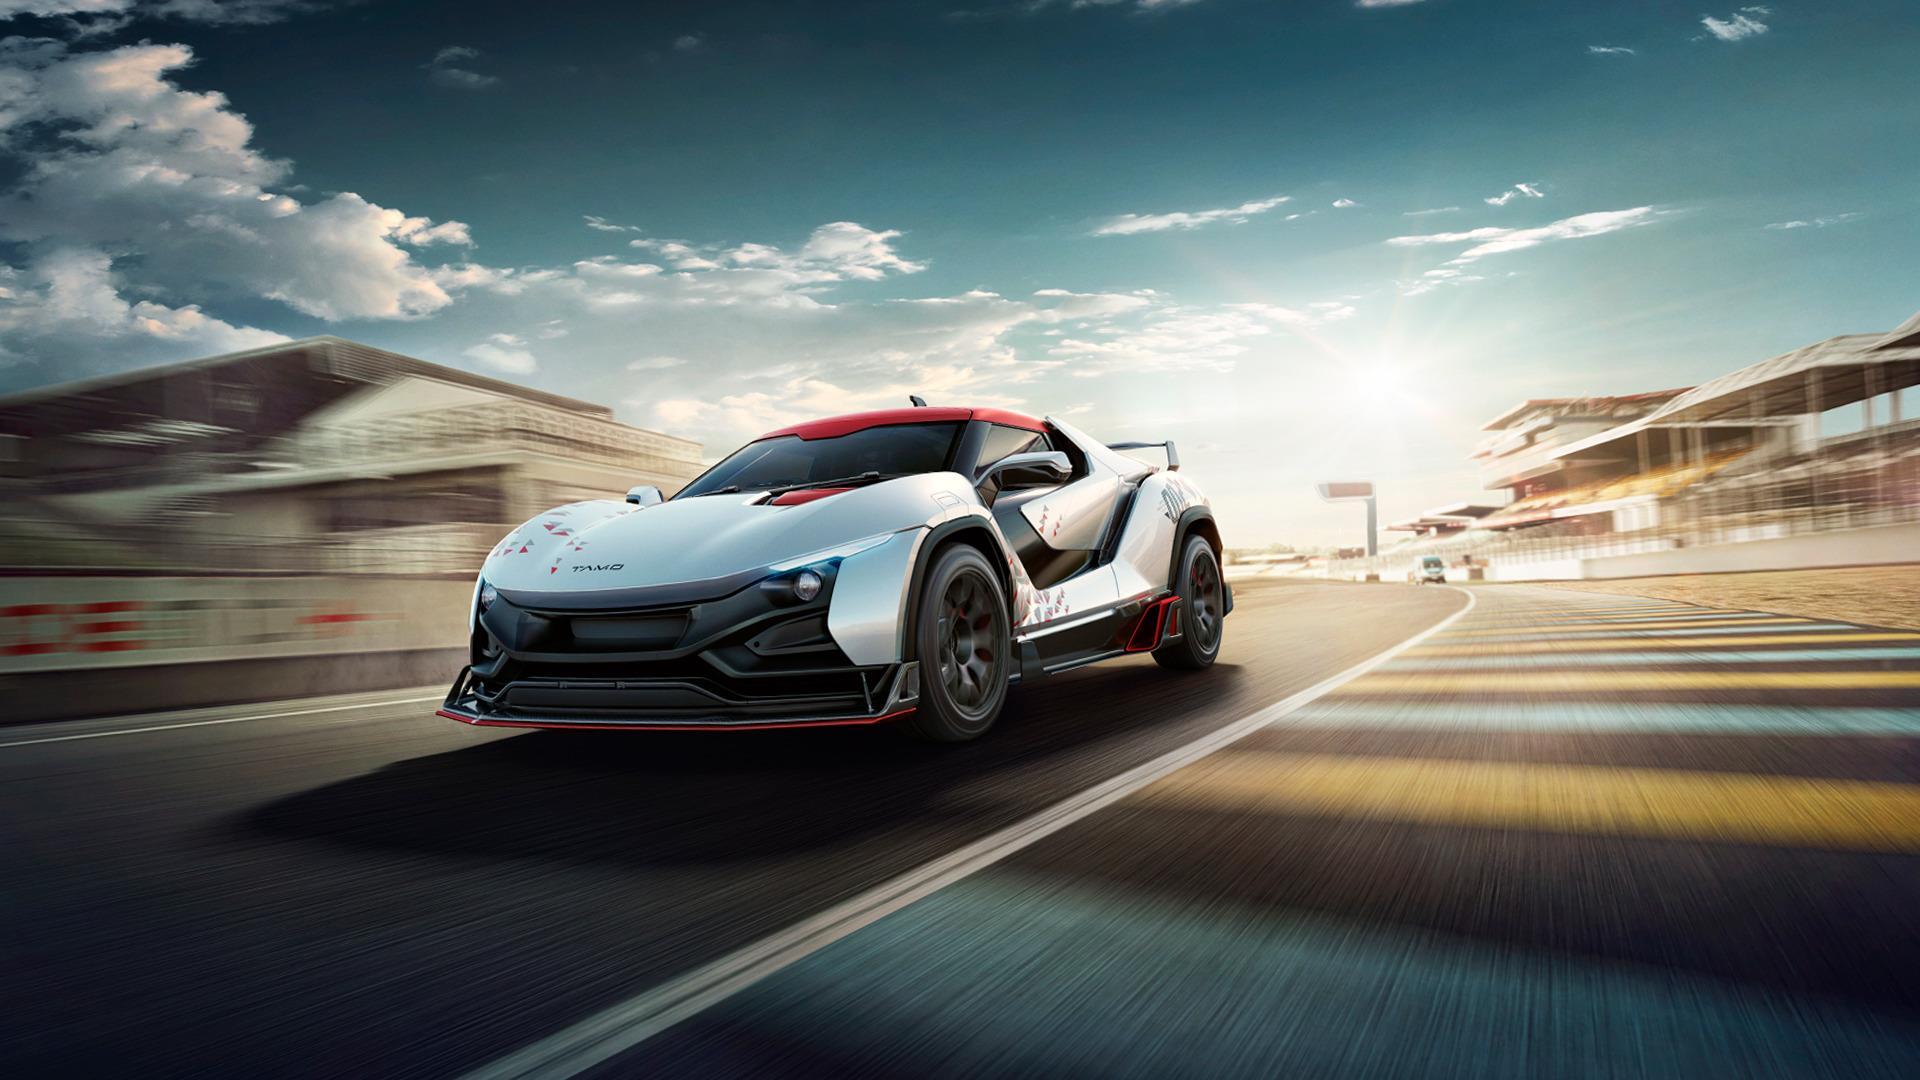 Tata Racemo sportscar image gallery